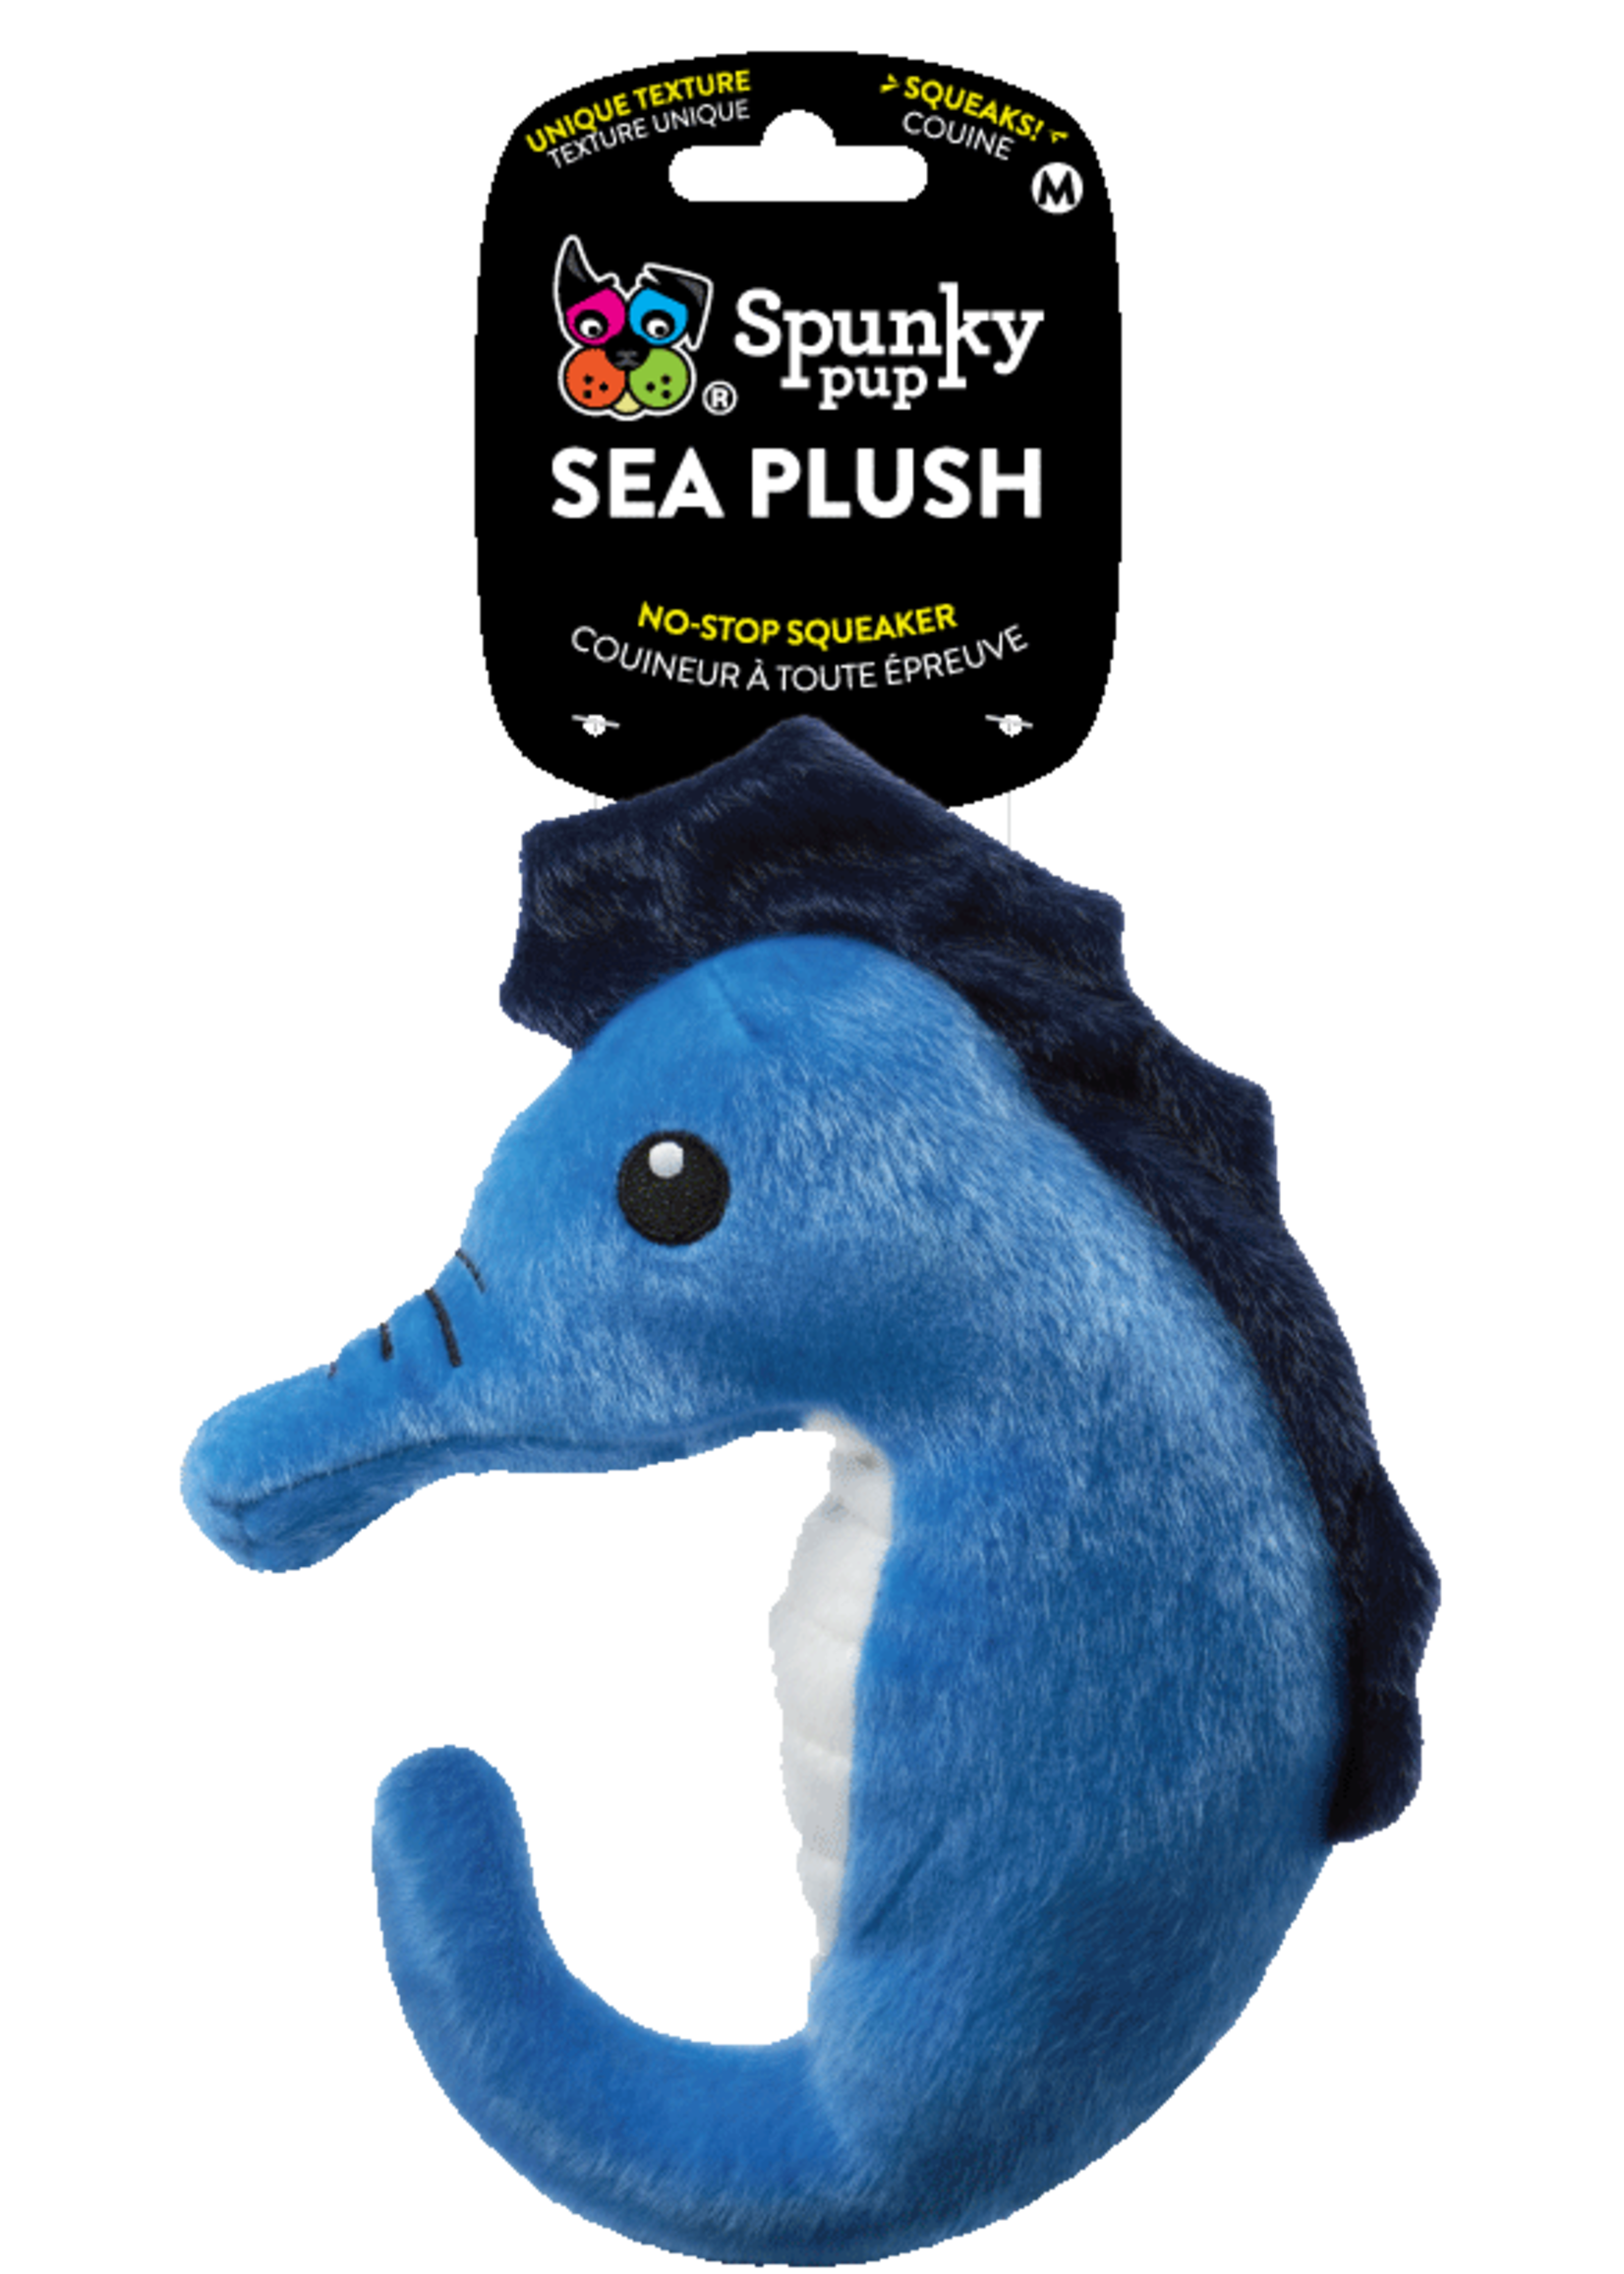 Spunky Pup Spunky Pup Sea Plush Seahorse Small